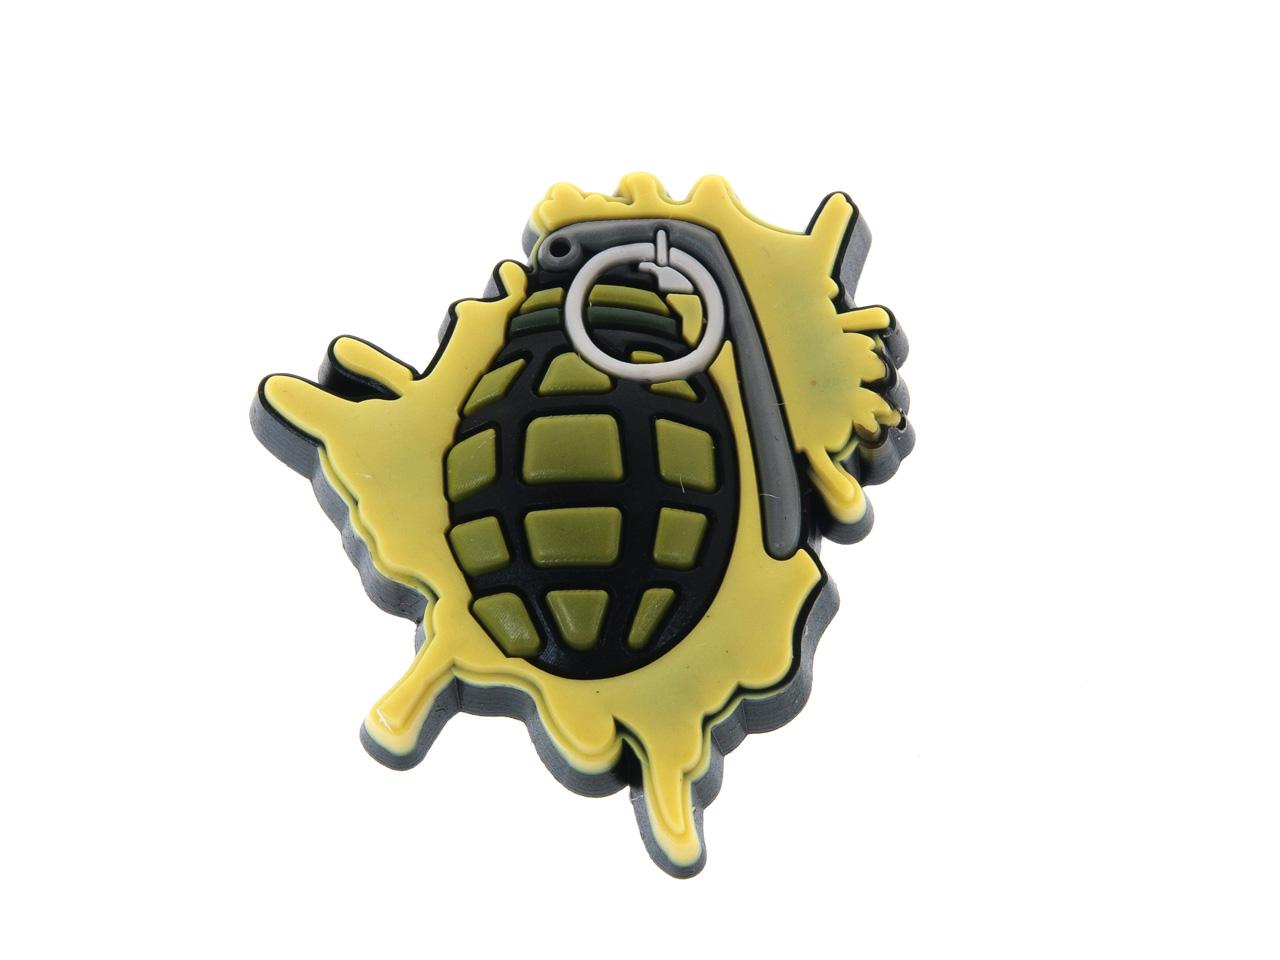 Accessoire-chaussures-Crocs-Jibbitz-pack-3-militaire-Assorties-53533-Neuf